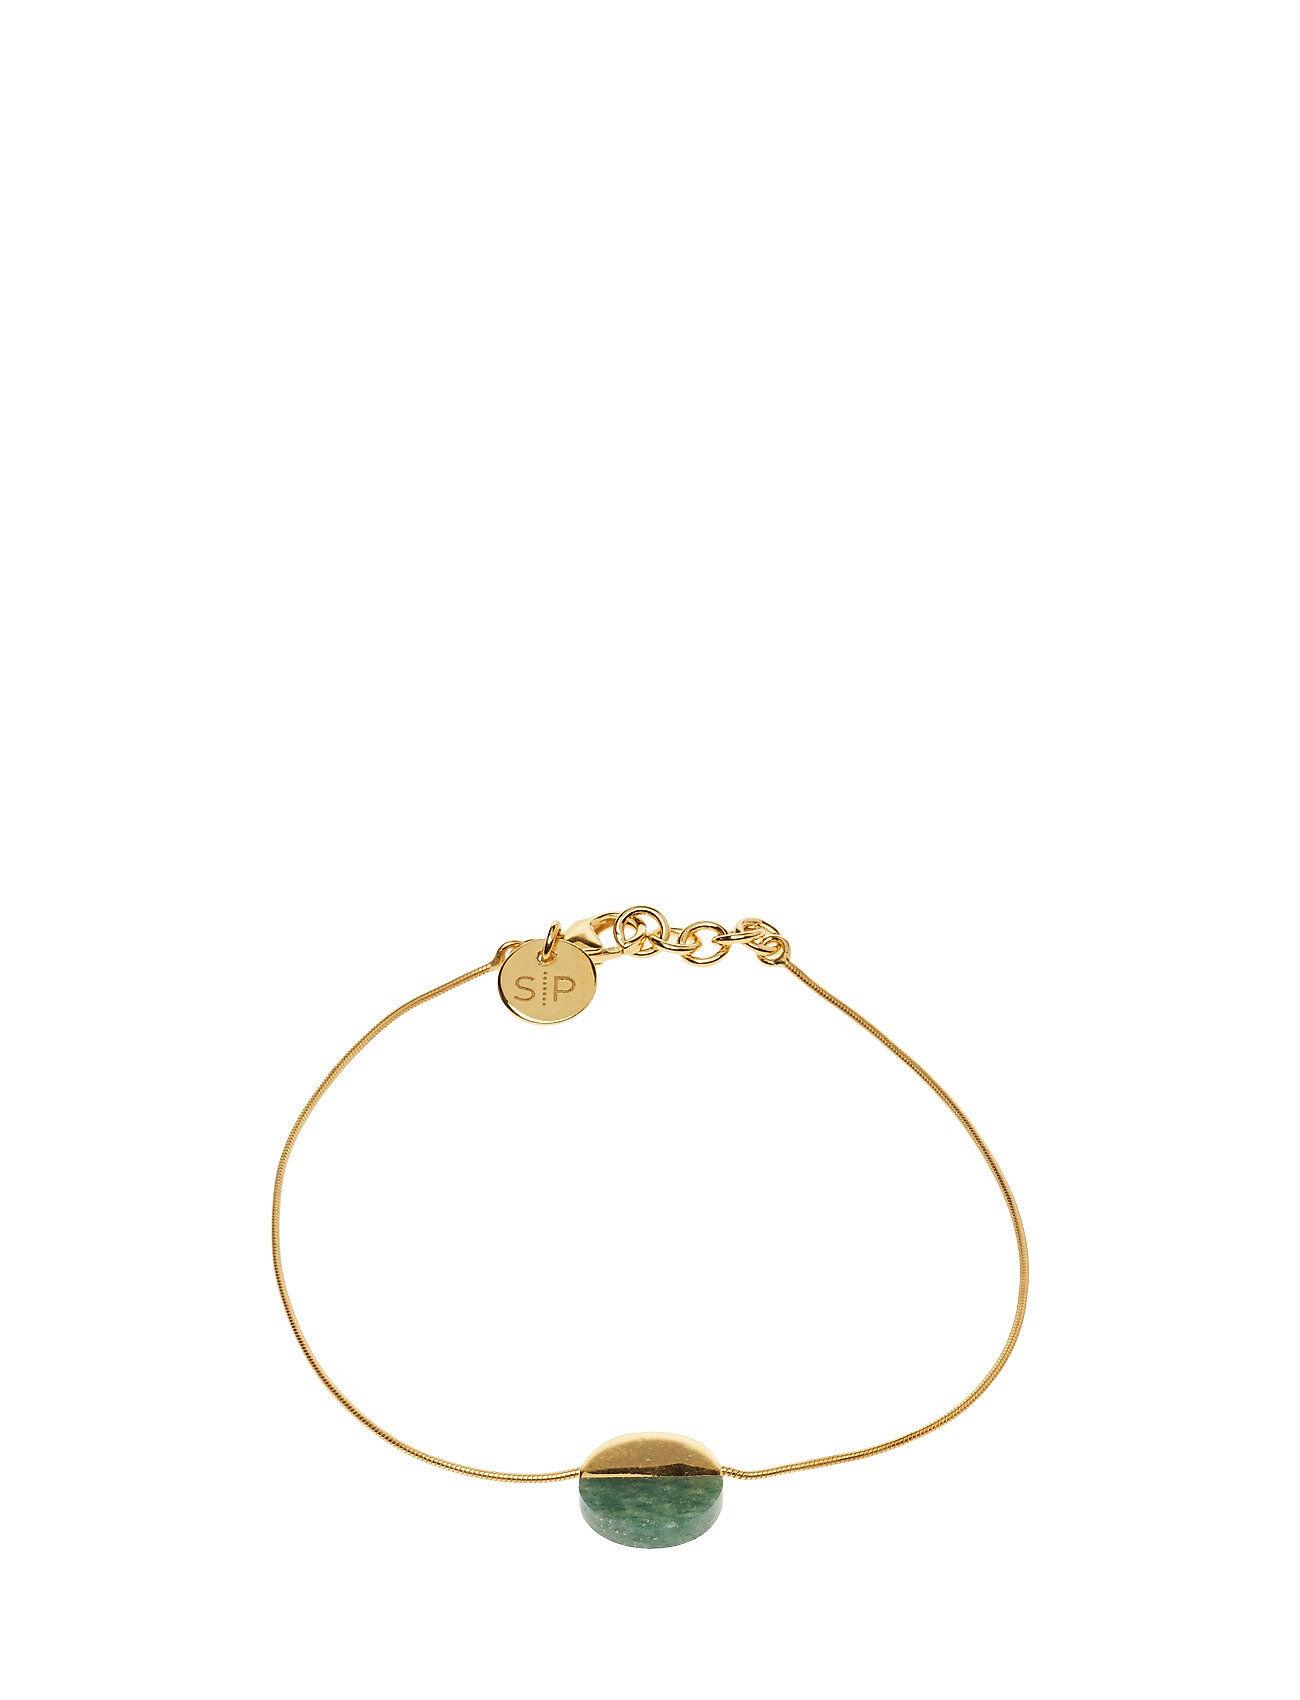 Syster P New Dixxi Bracelet Green Aventurine